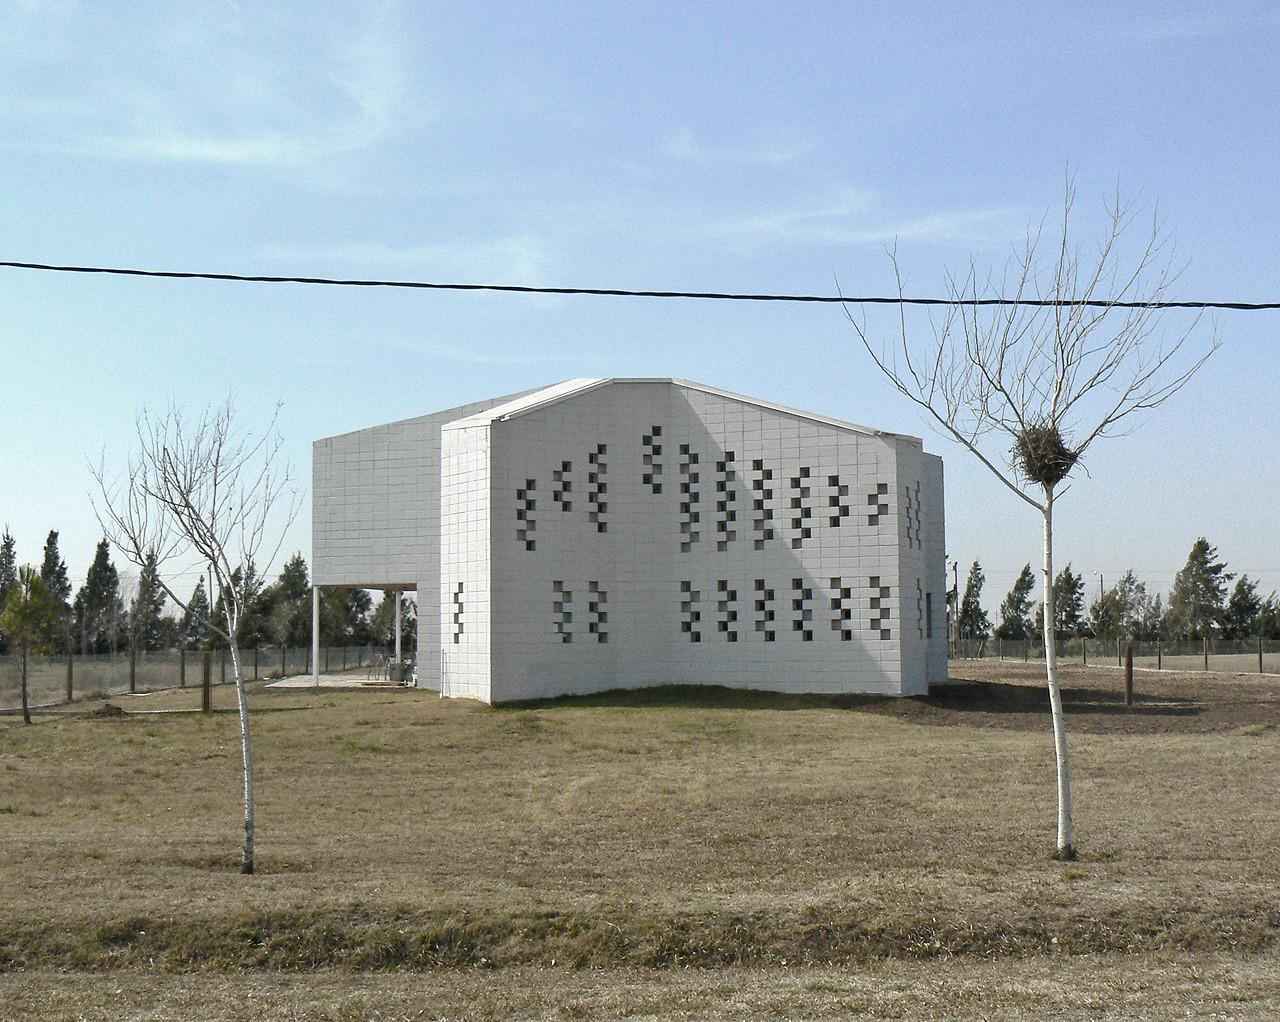 Raigal House / Marcelo Villafañe, © Walter G. Salcedo